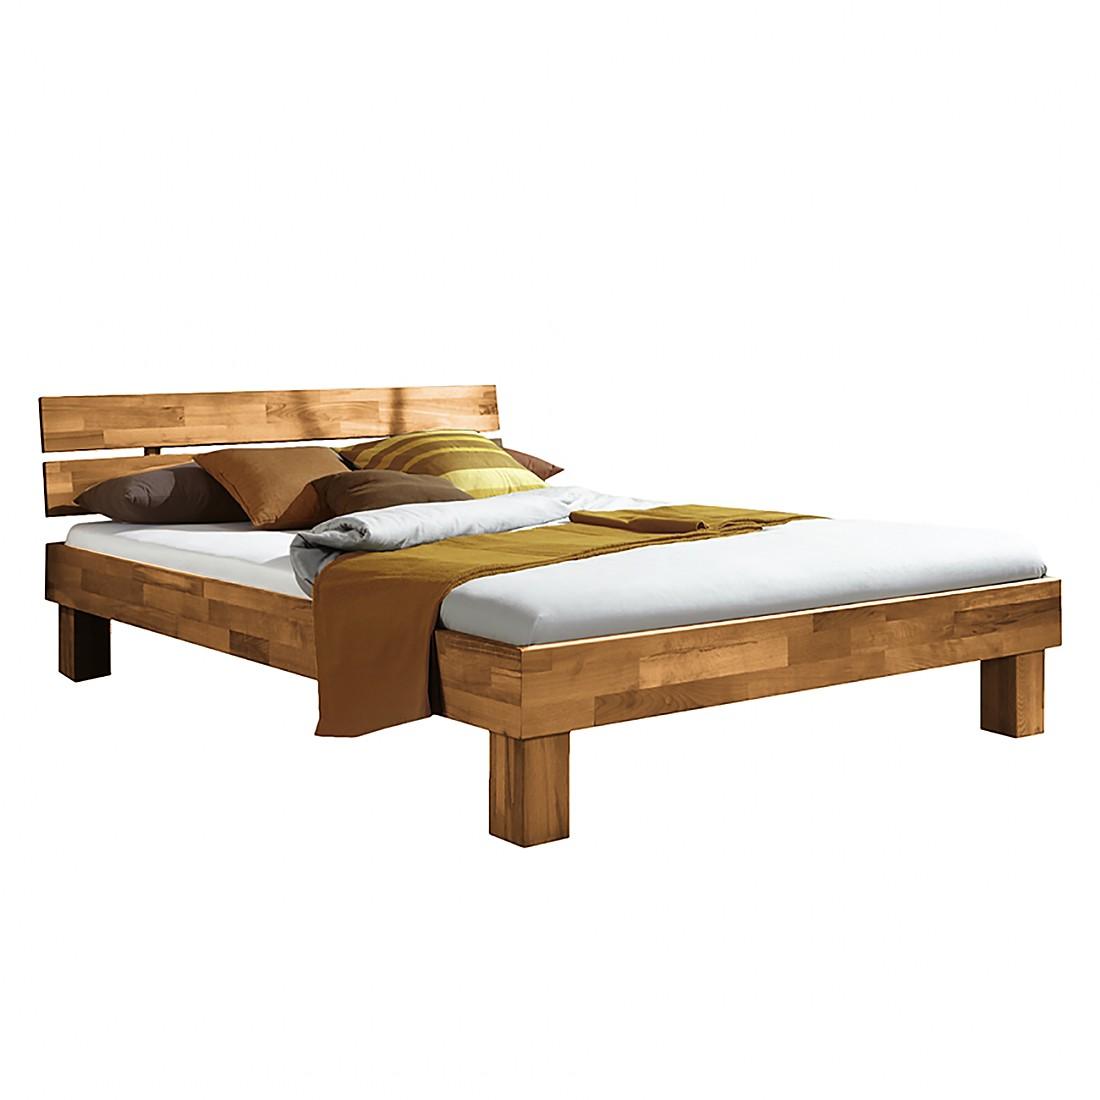 massivholzbett areswood ii wildeiche massiv ge lt. Black Bedroom Furniture Sets. Home Design Ideas